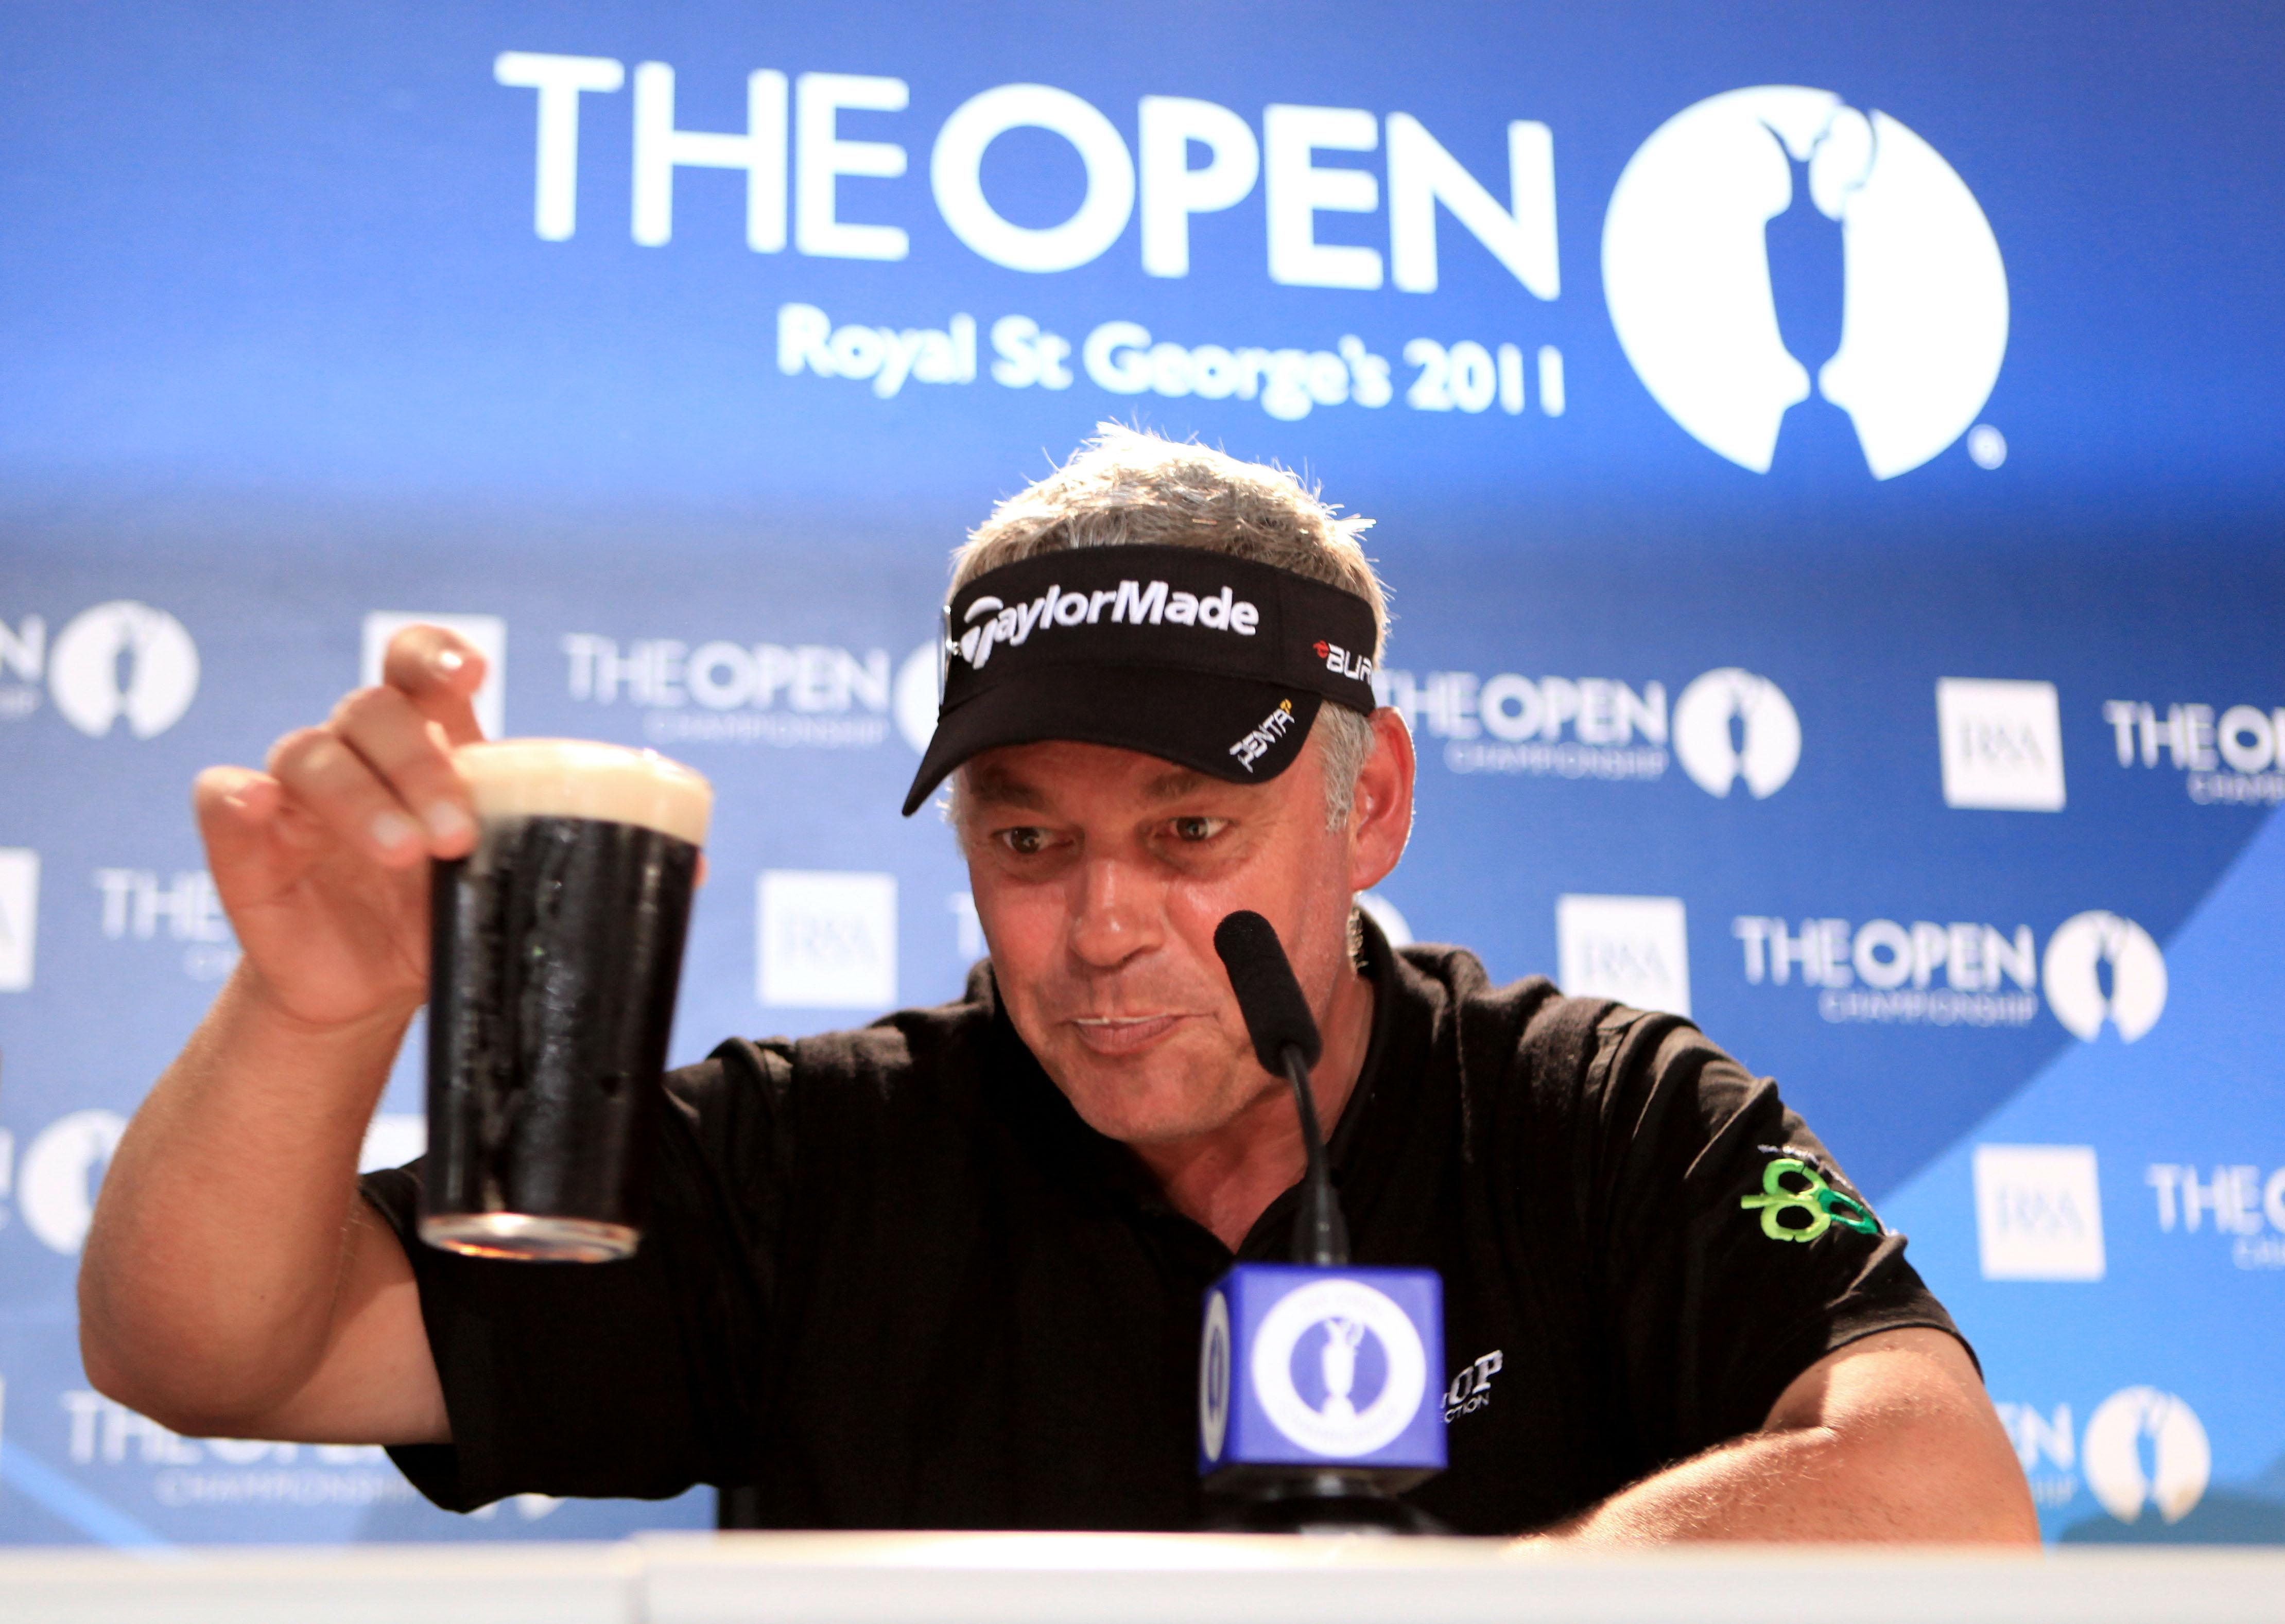 Darren Clarke after winning the 2011 British Open